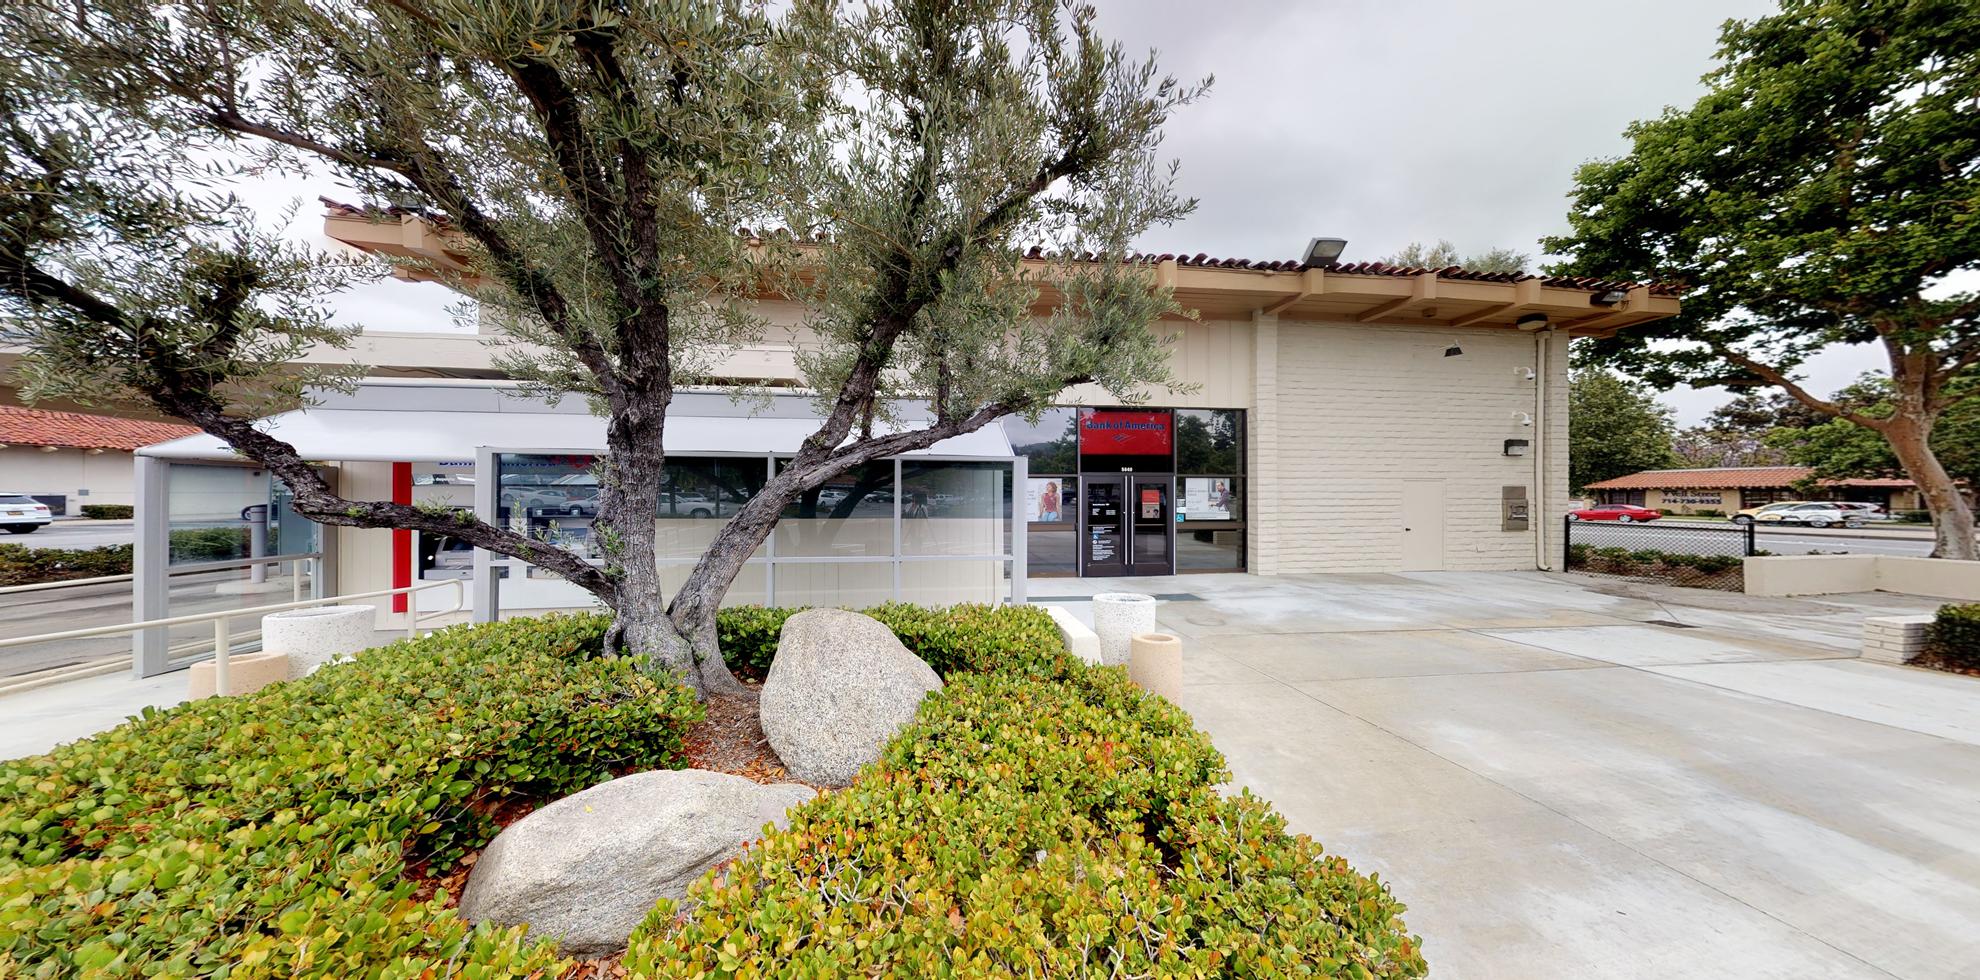 Bank of America financial center with drive-thru ATM | 5640 E Santa Ana Canyon Rd, Anaheim, CA 92807